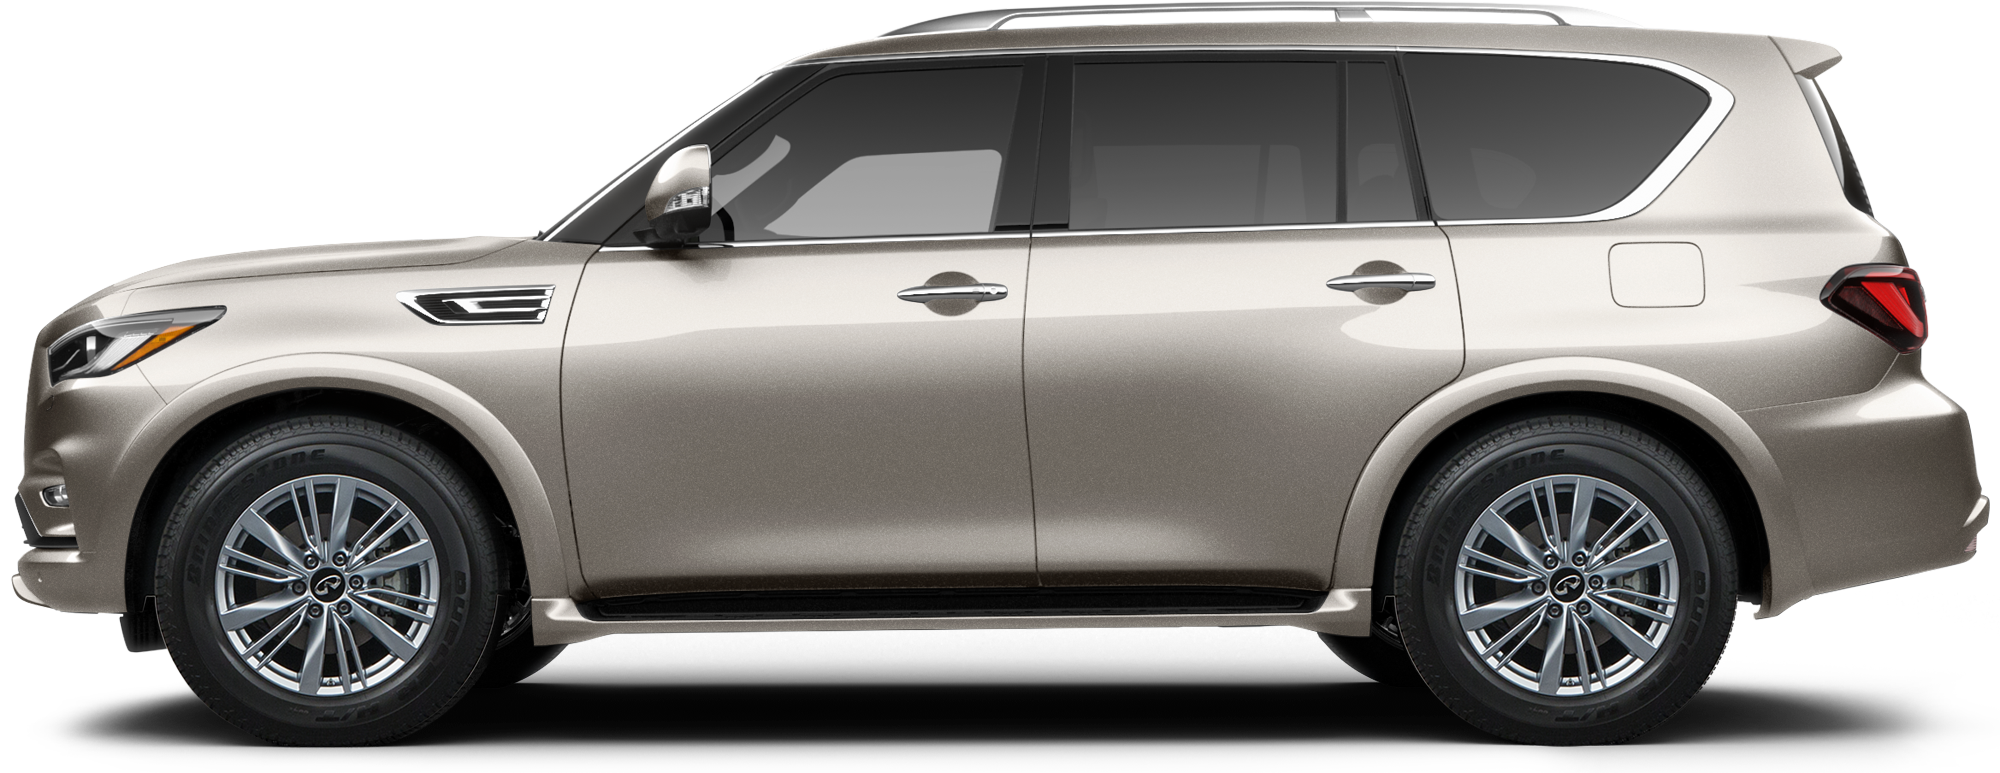 2021 INFINITI QX80 SUV LUXE